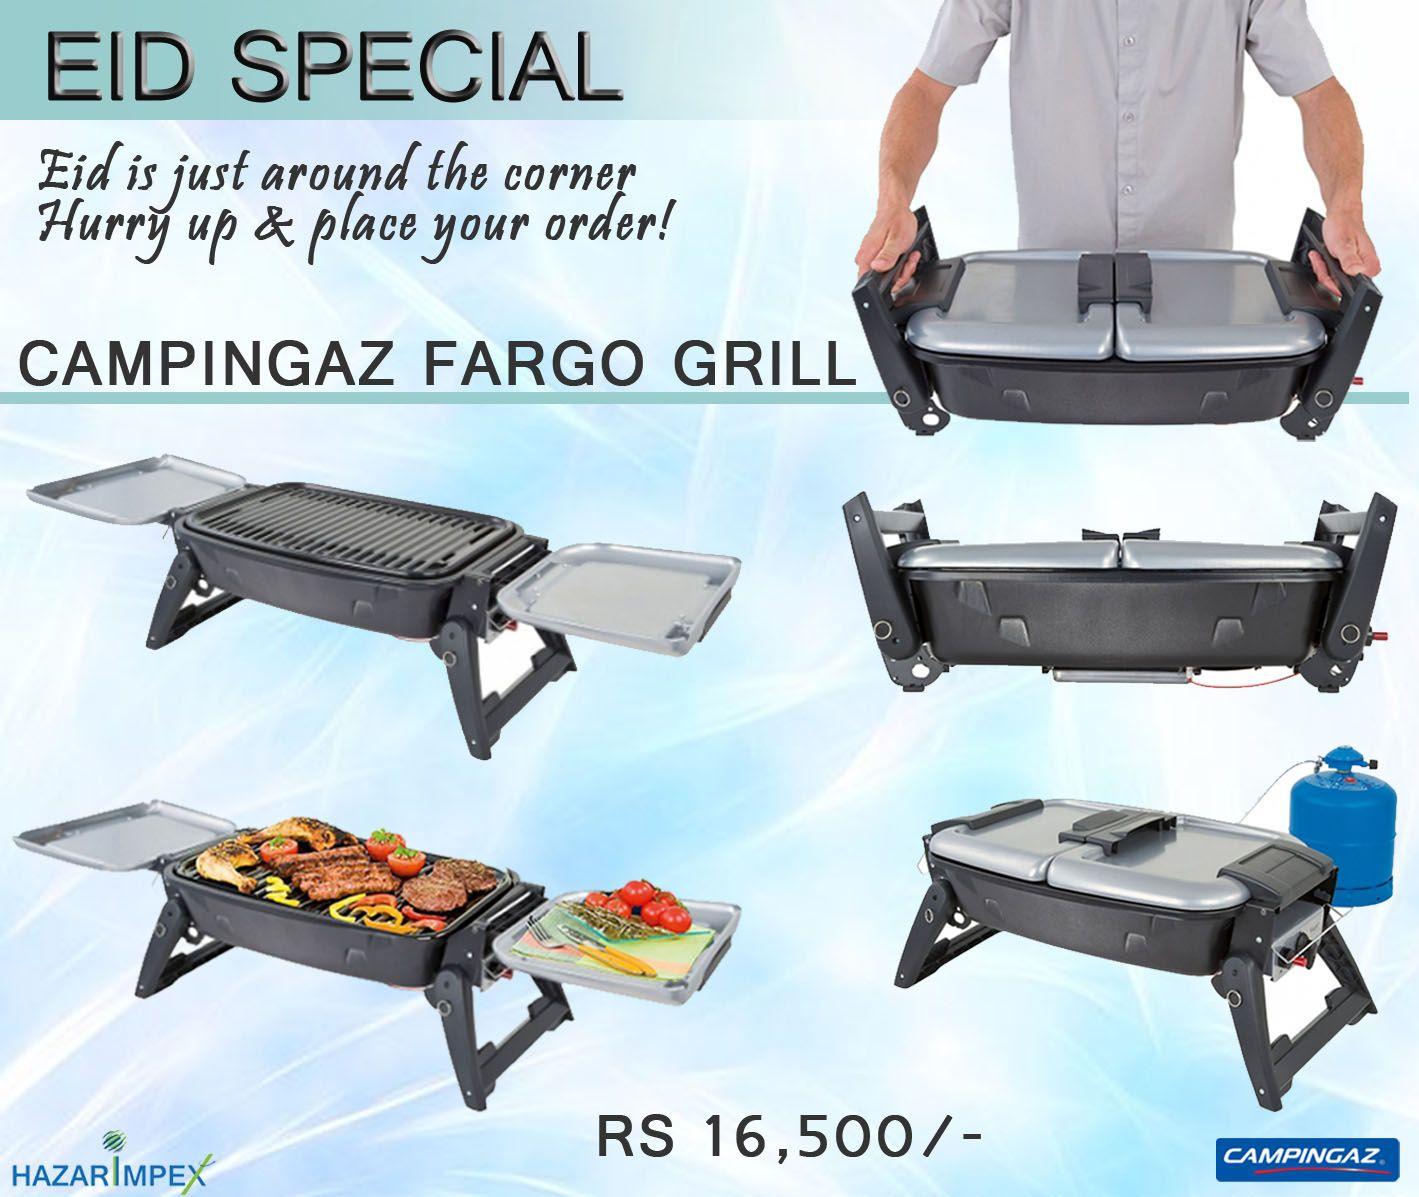 Campingaz Fargo Grill Rs 16,500/- Shop Online: http://shop.hazari ...